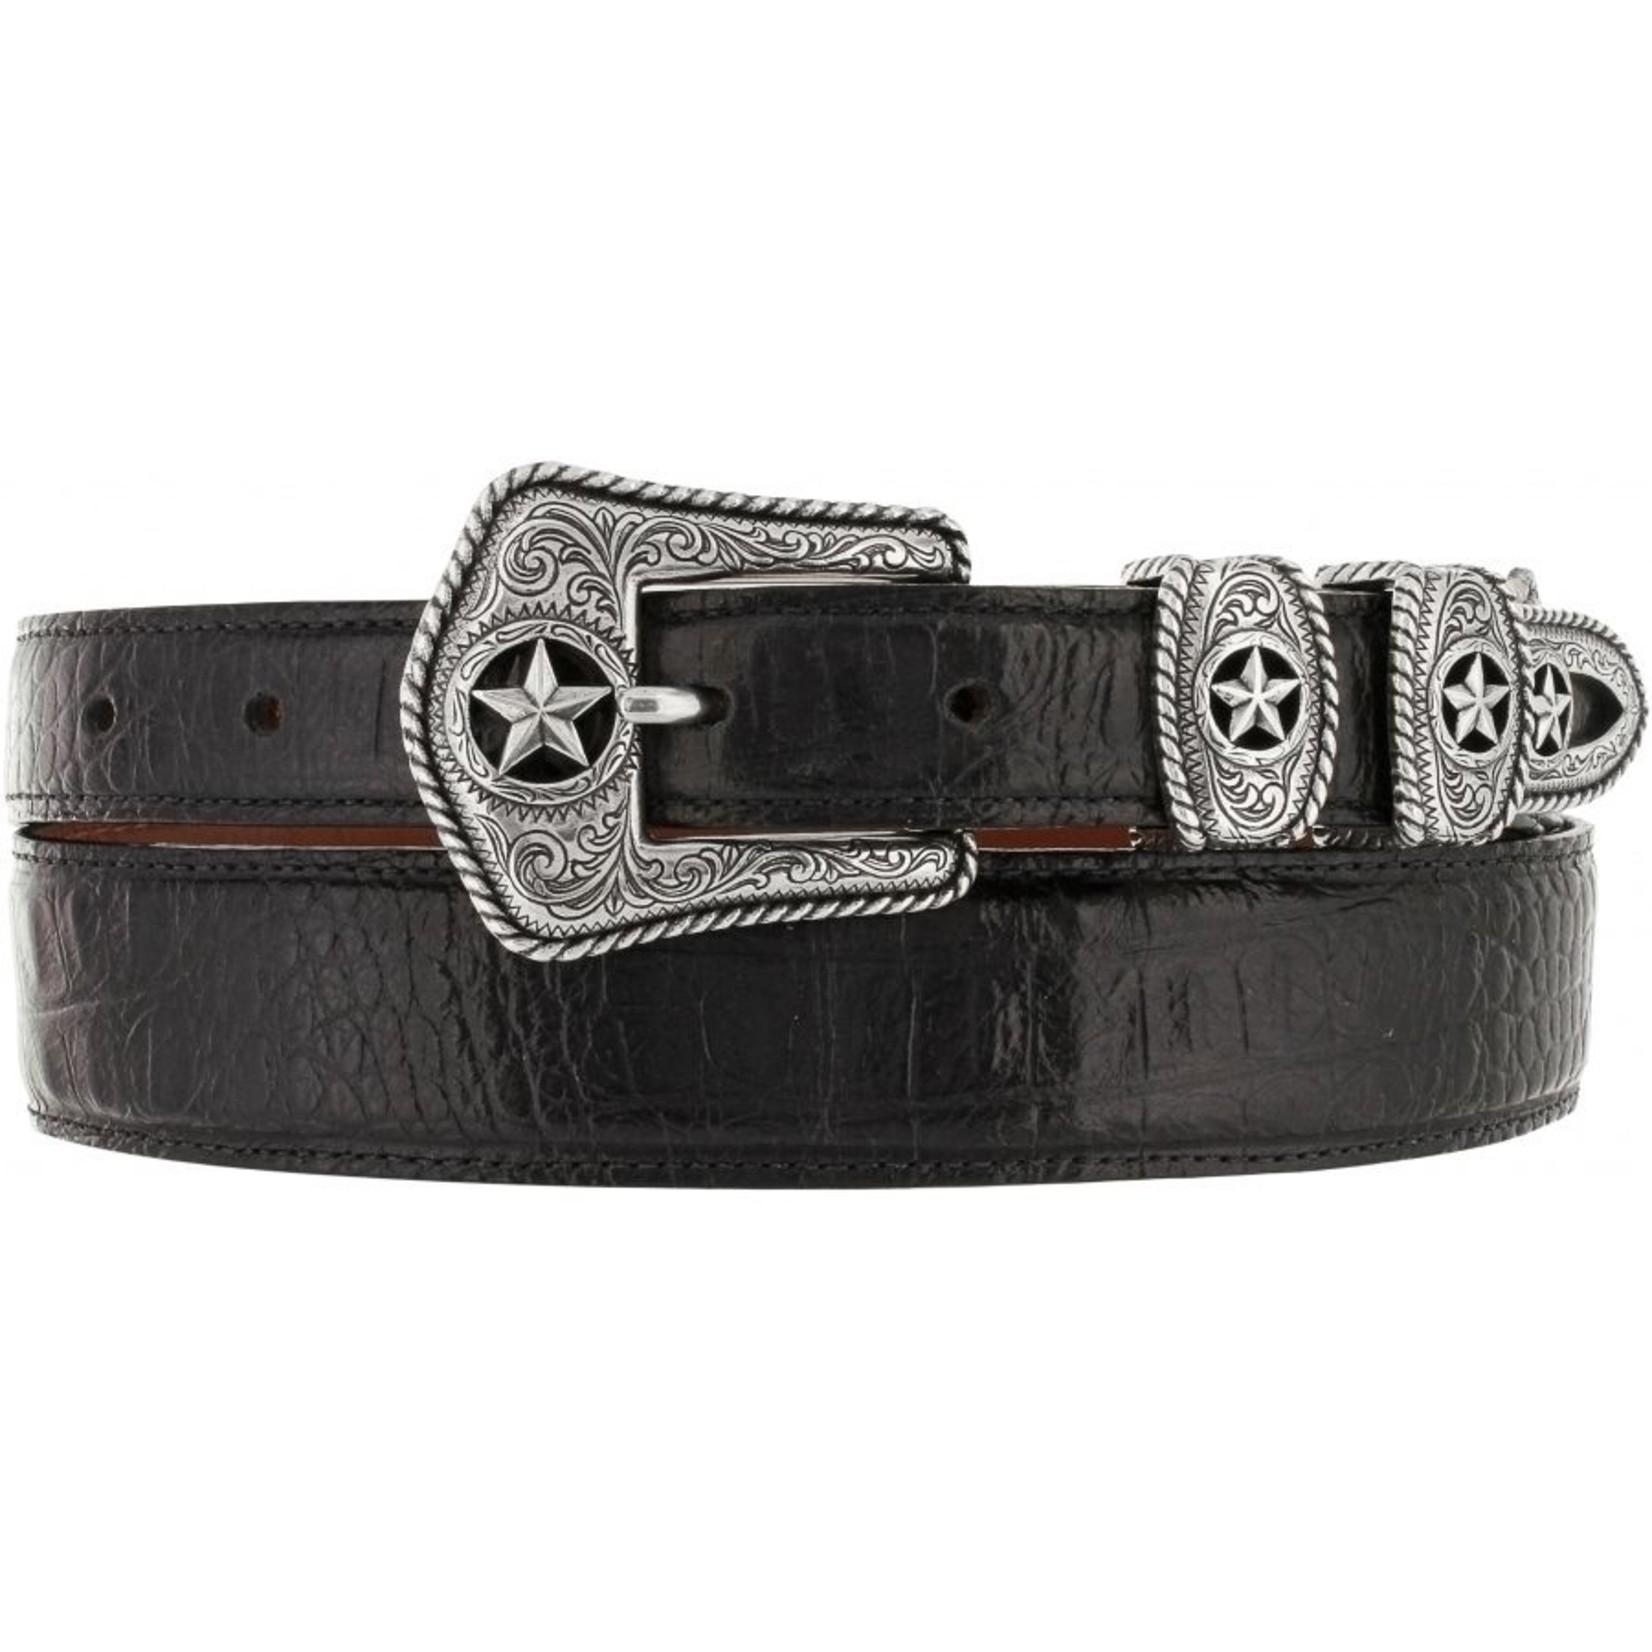 Leegin Tony Lama Country Croc Belt Black C42123